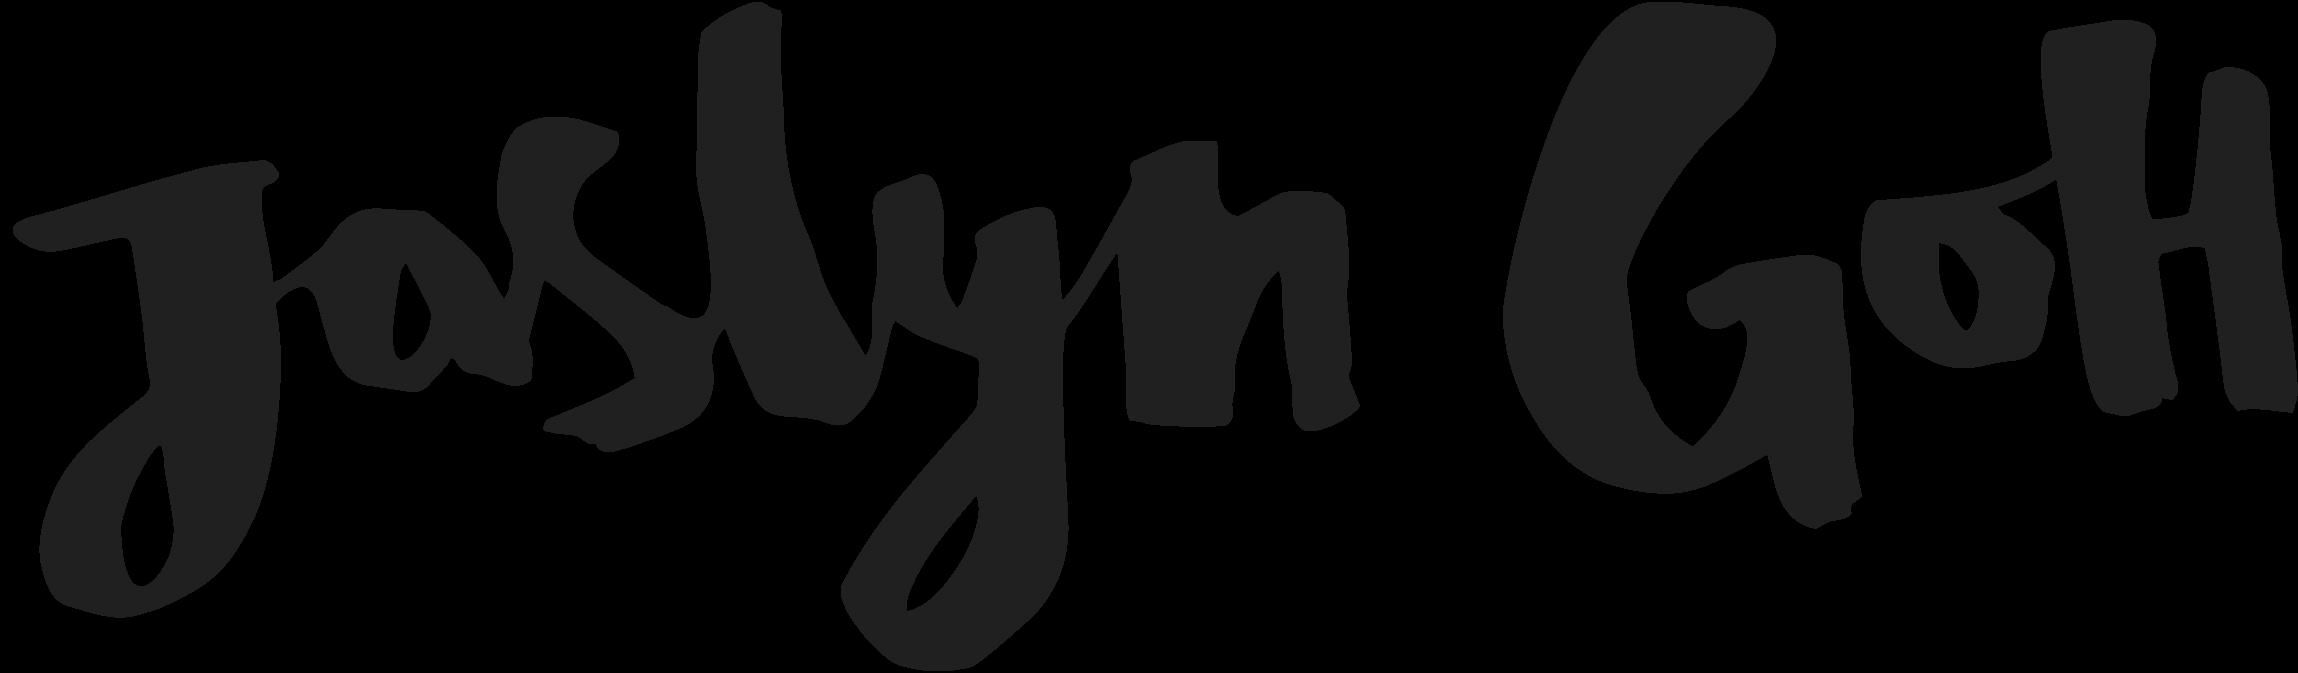 jaslyn namestyle_FINAL.png